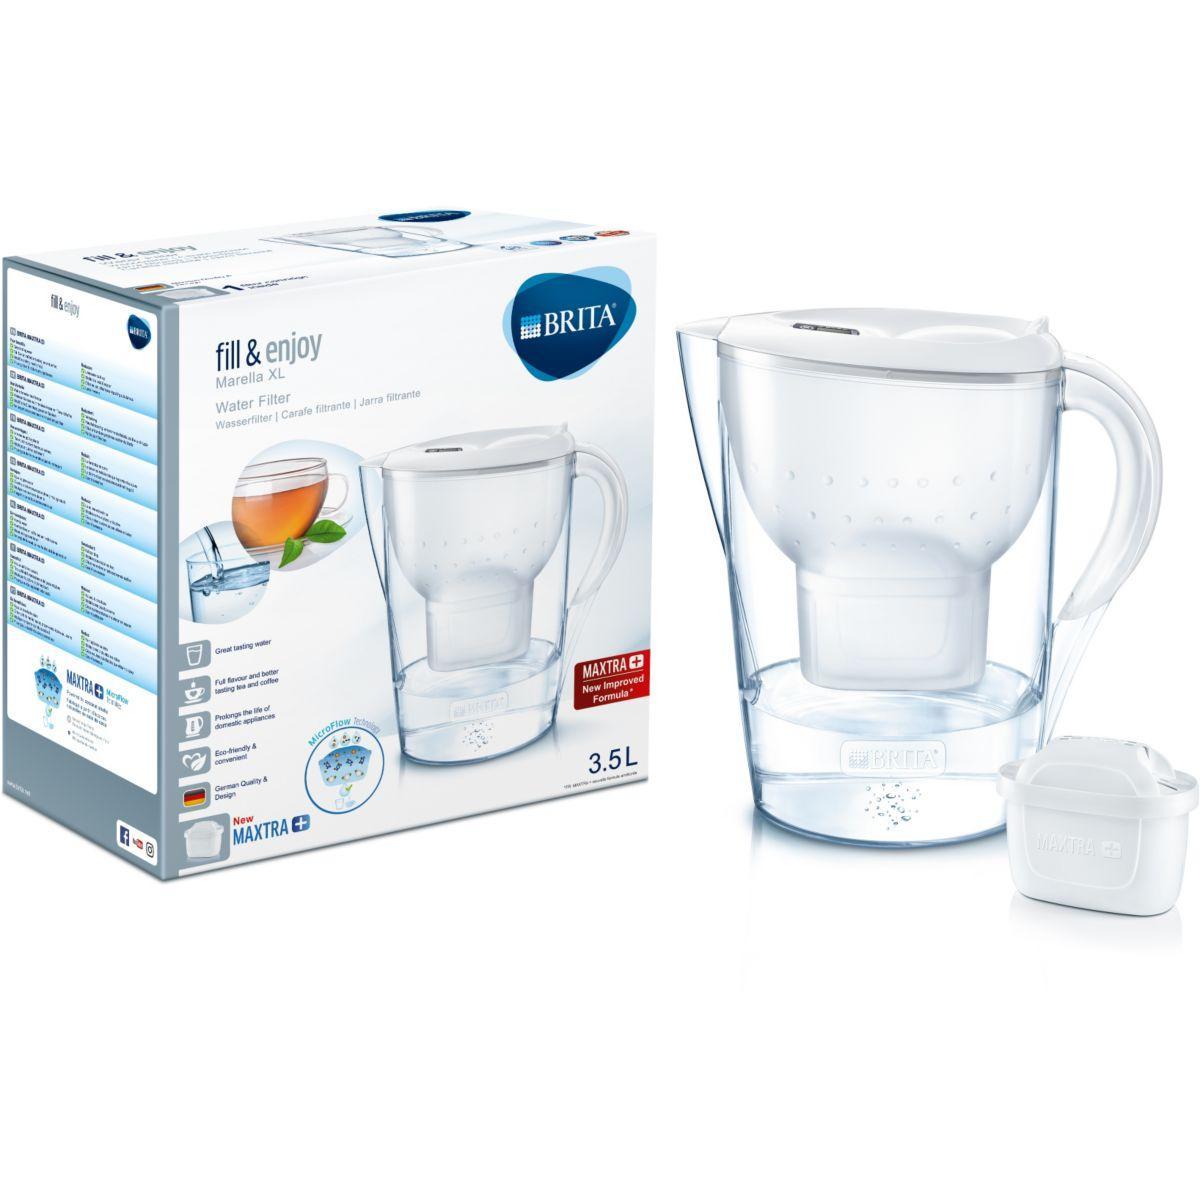 Image of BRITA Marella XL Filtre à eau pour carafe 3.5L Blanc